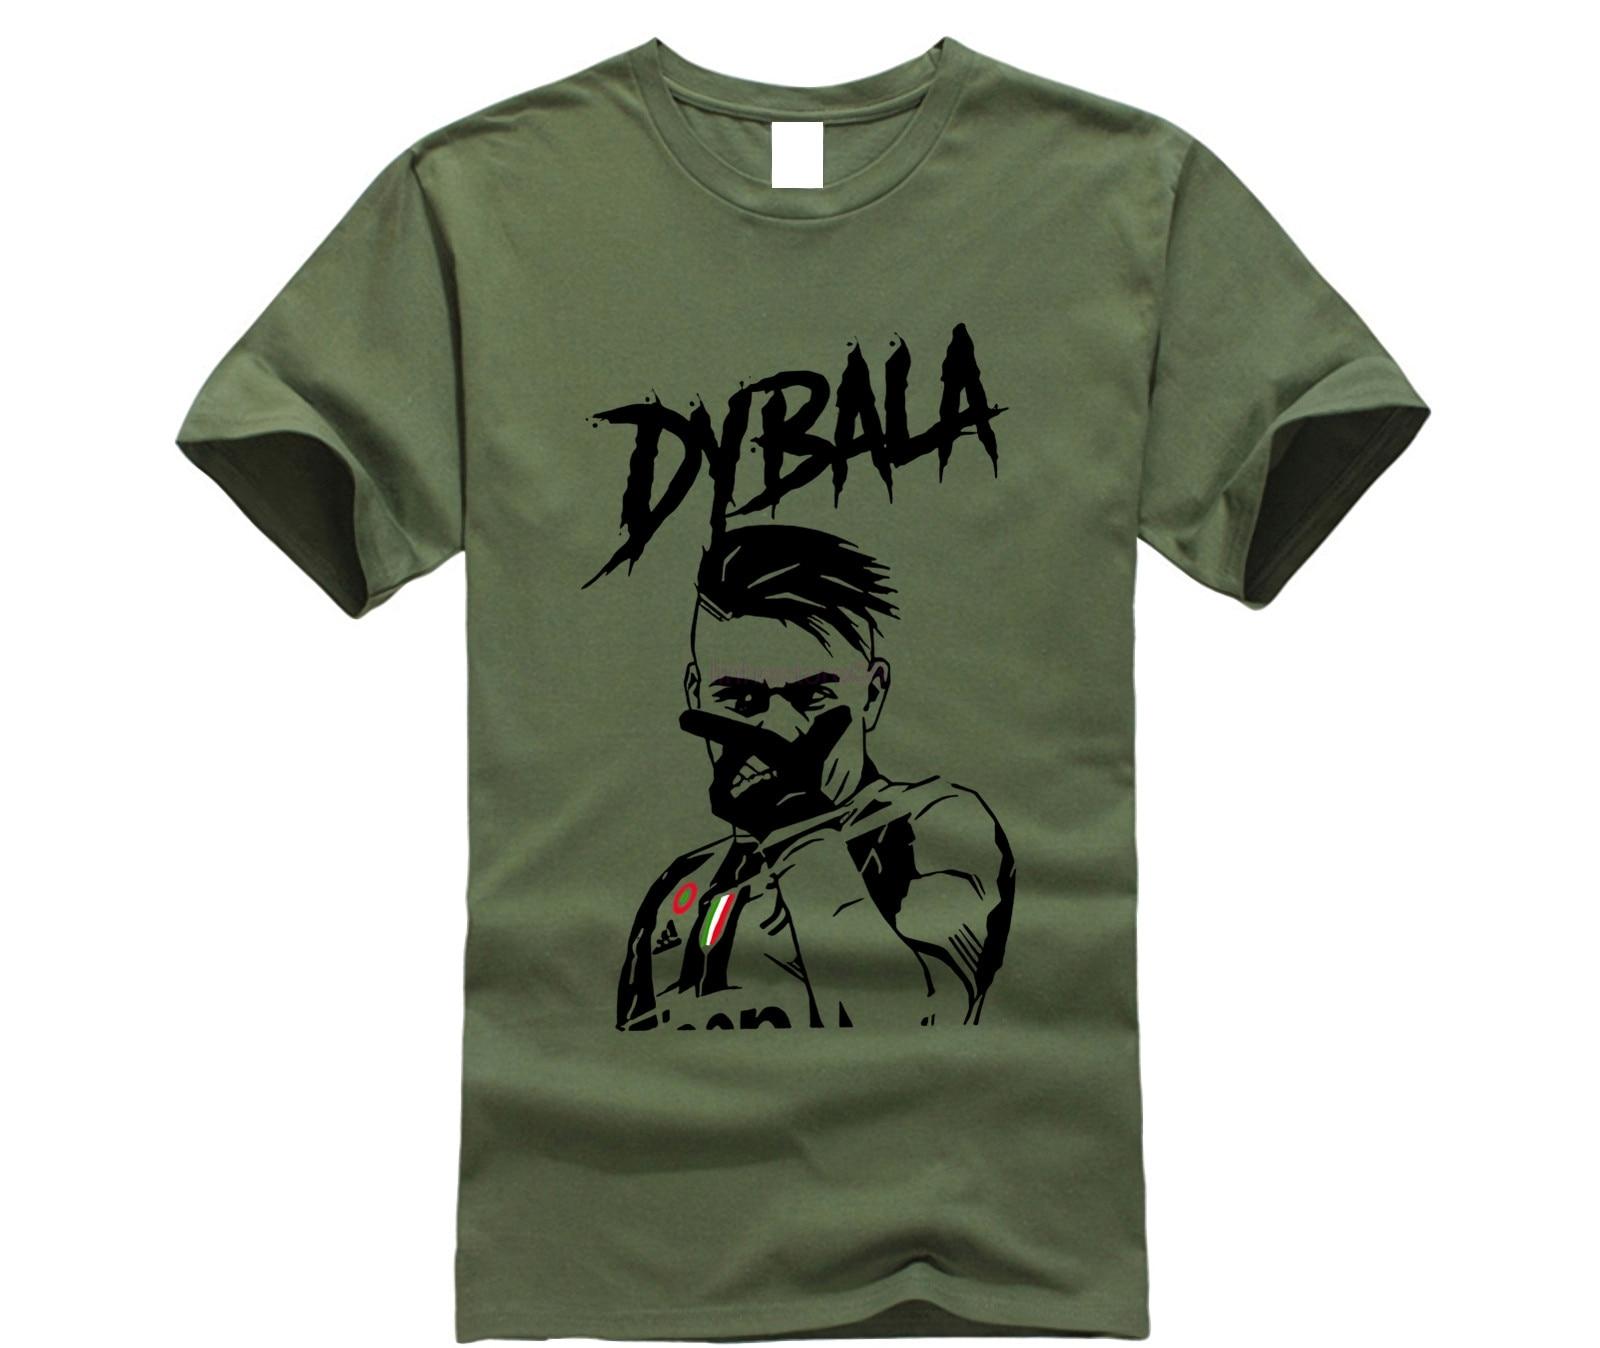 56cbc1825 Buy paulo dybala t shirt and get free shipping on AliExpress.com